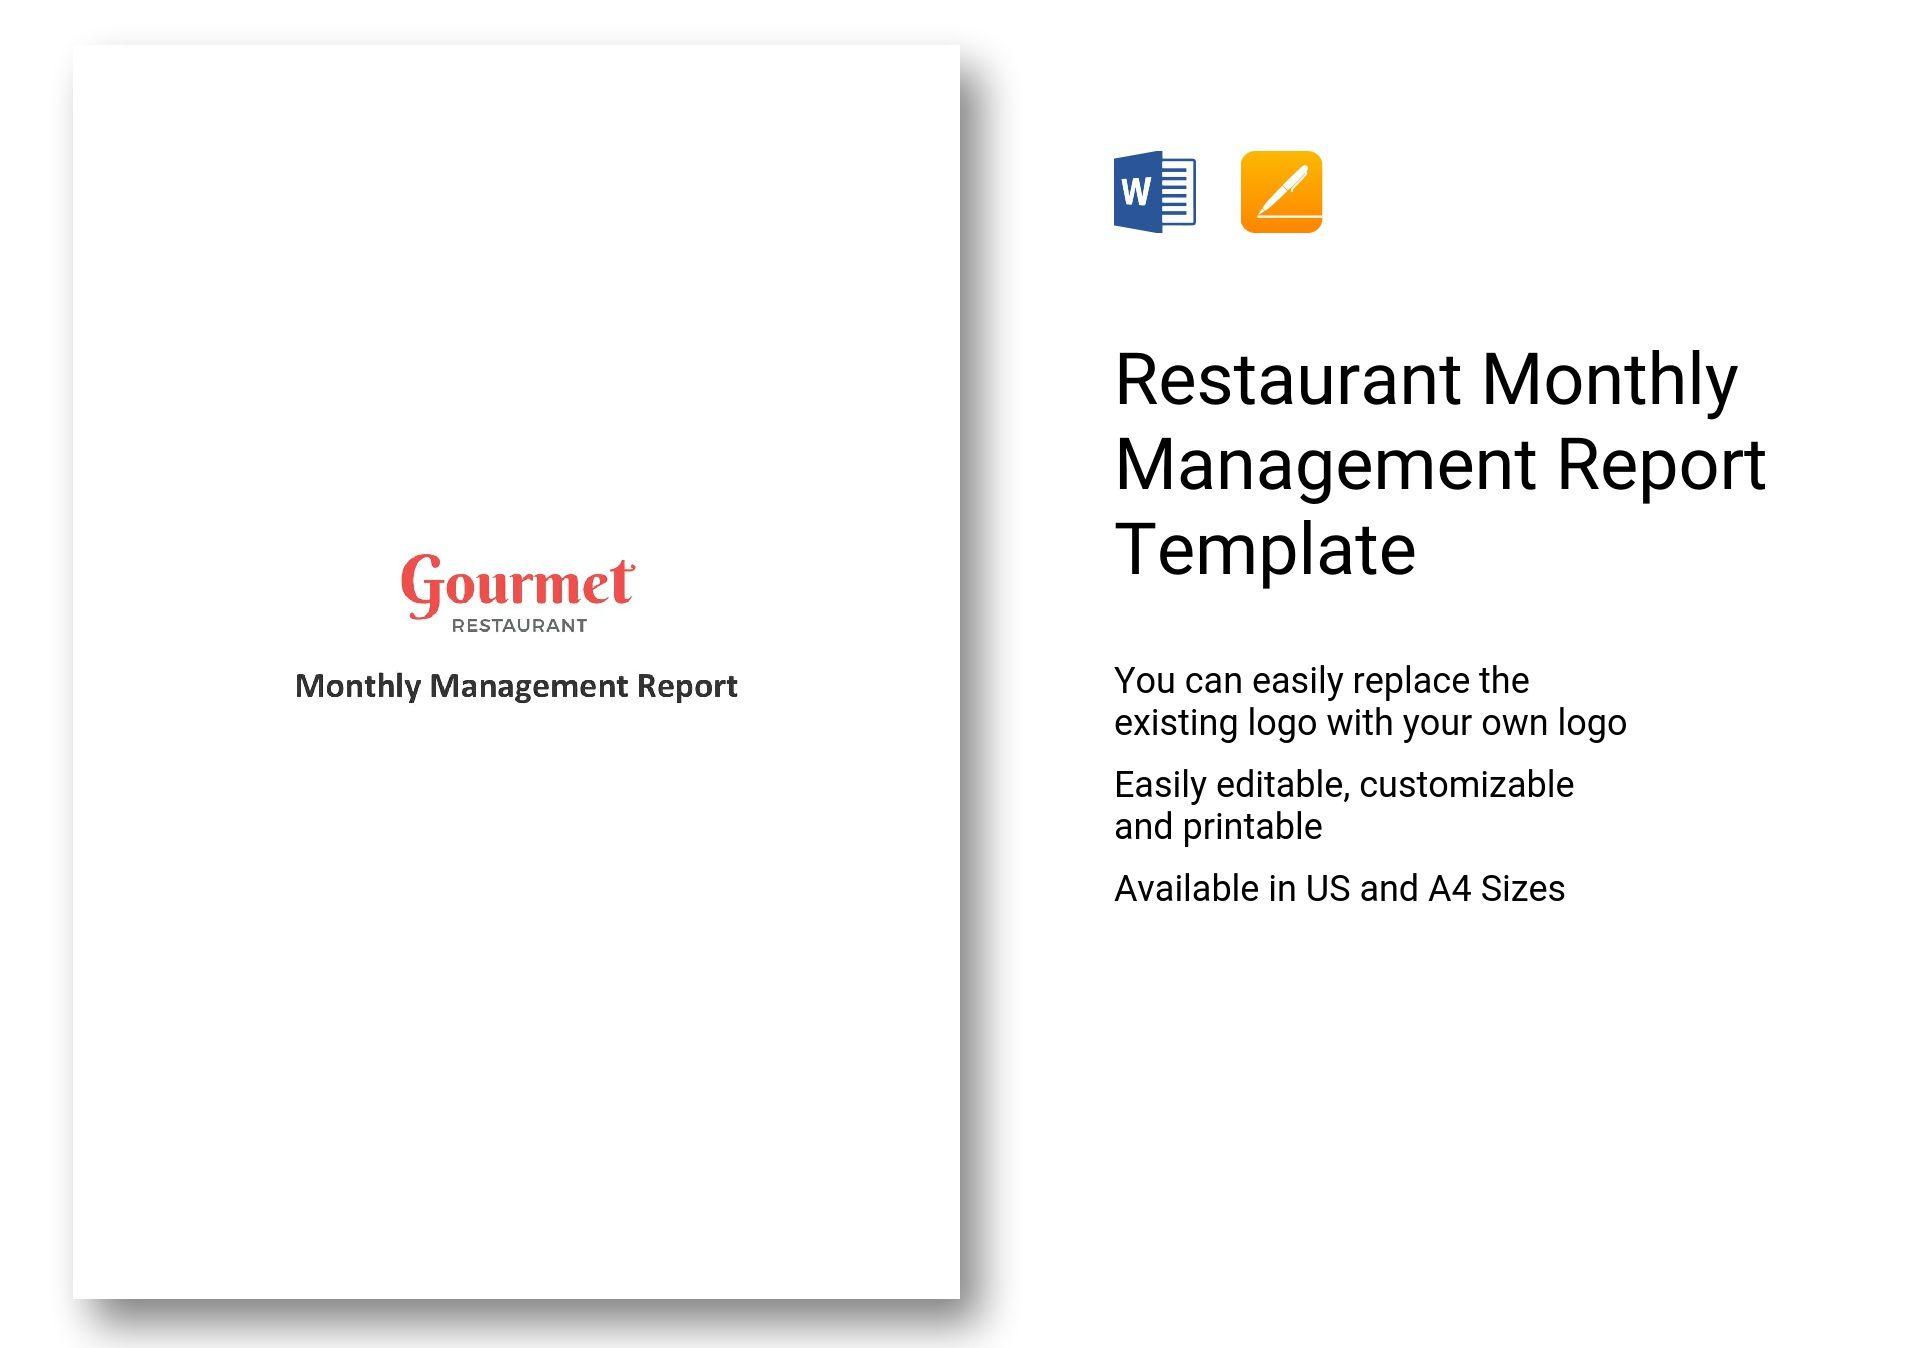 Restaurant Monthly Management Report